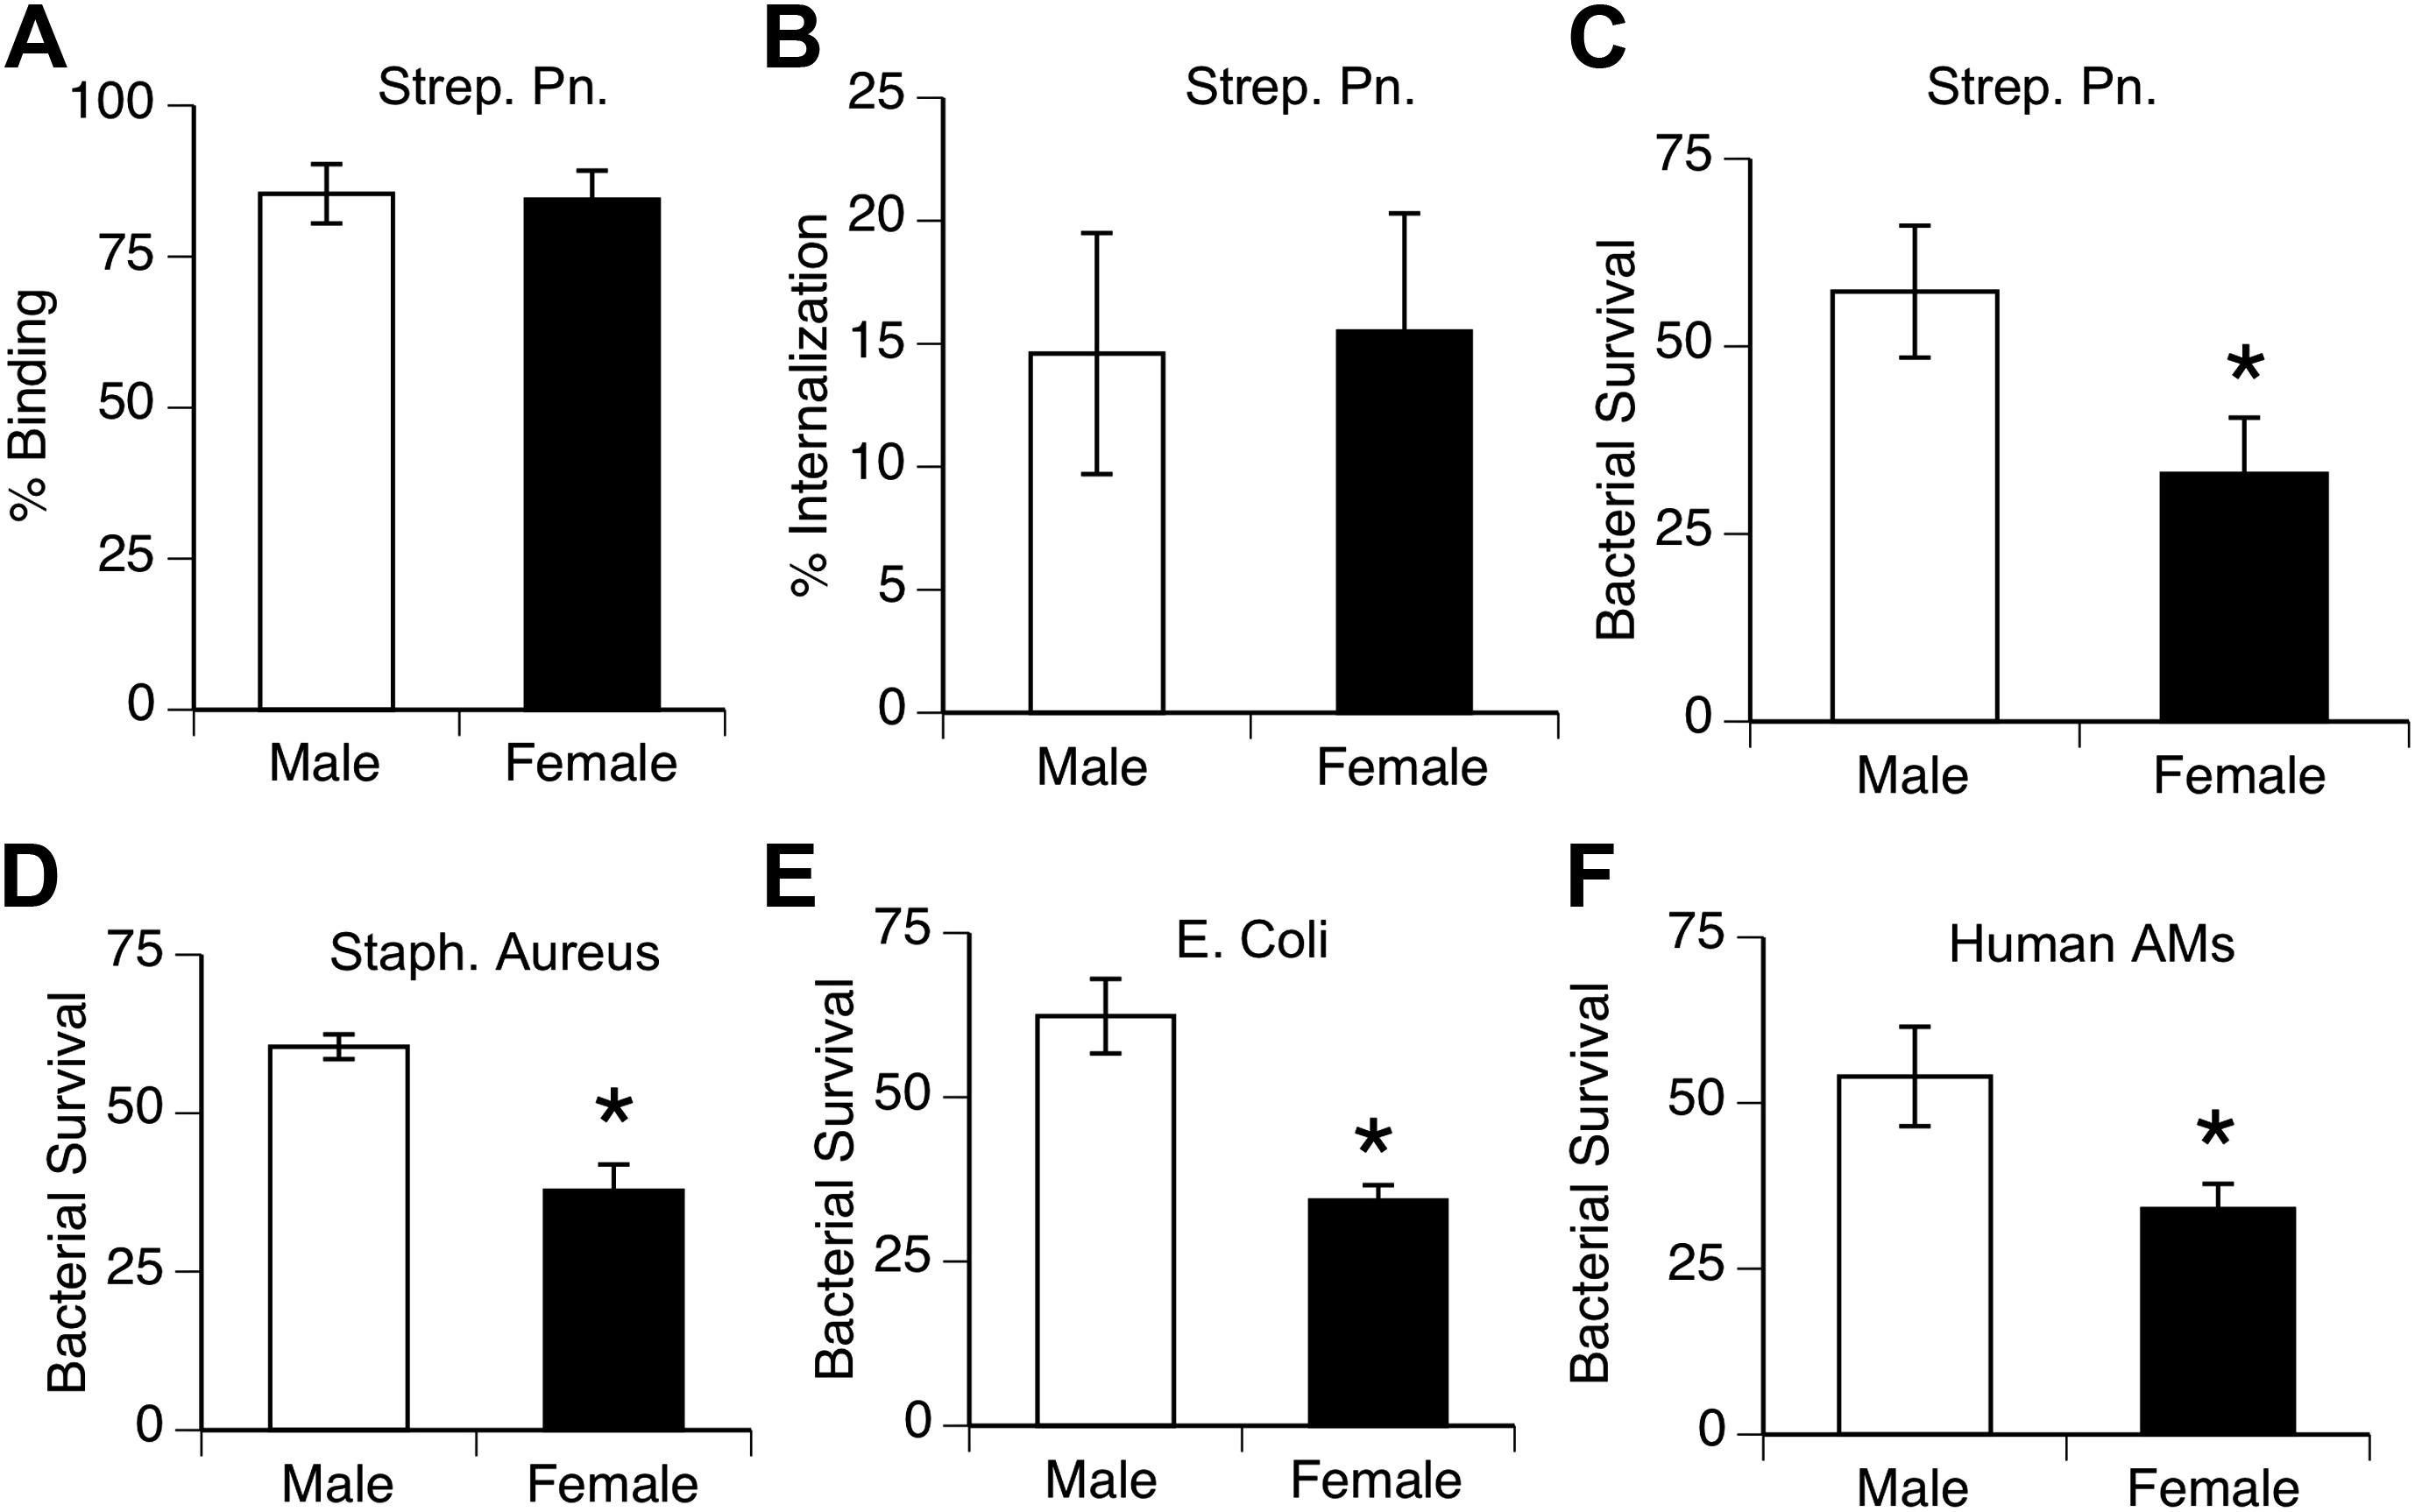 Female Resistance To Pneumonia Identifies Lung Macrophage